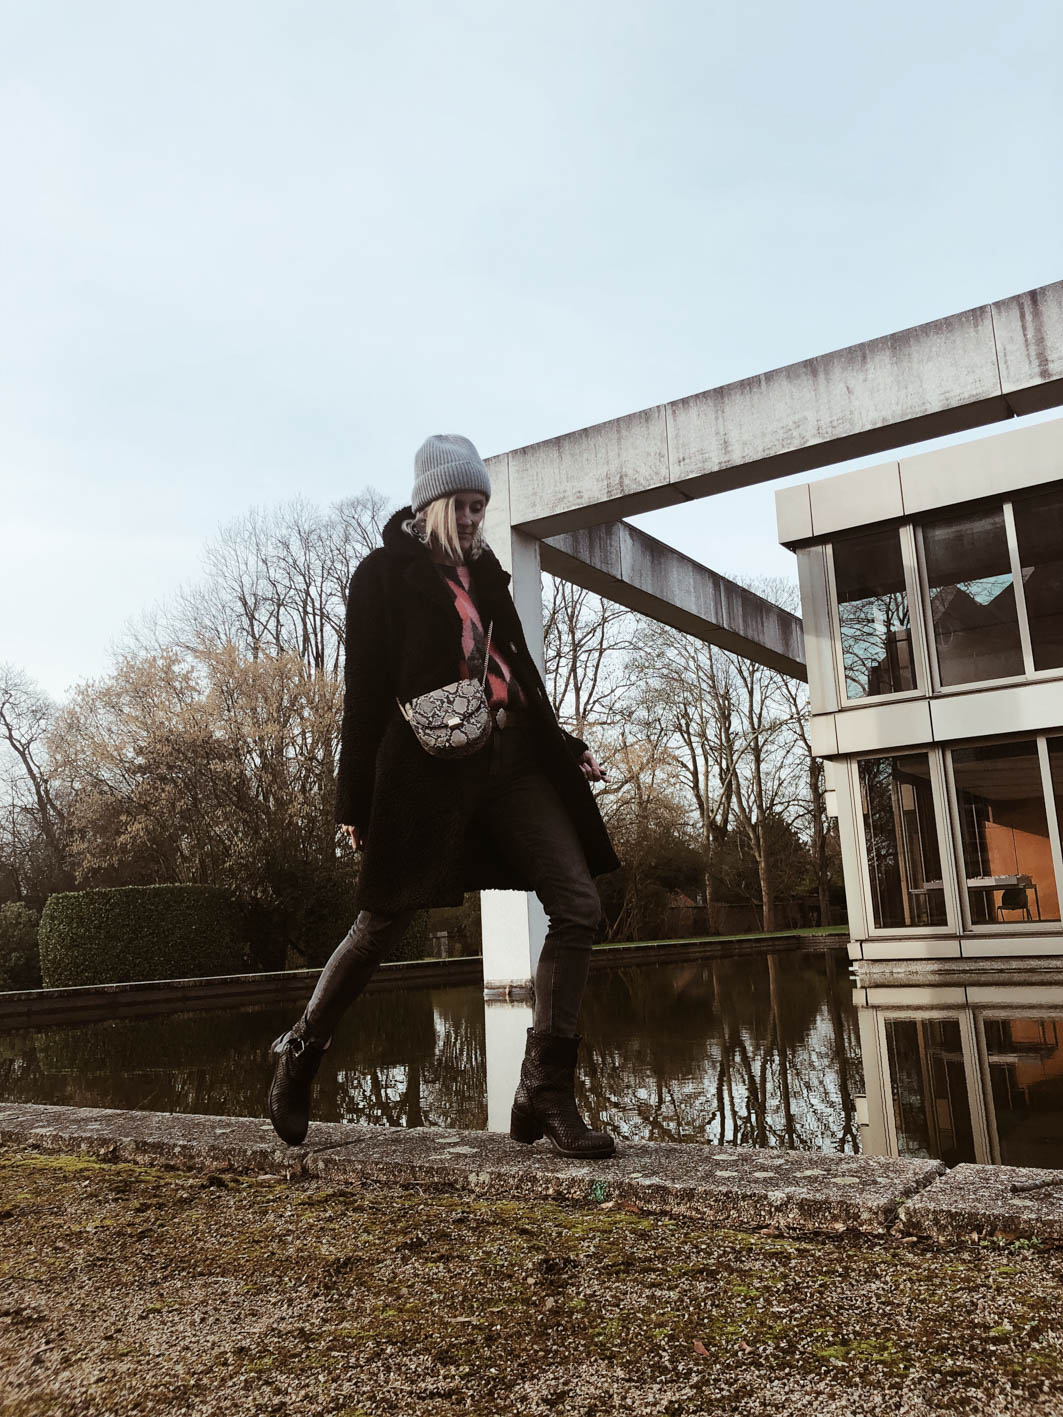 Carnet sauvage - Blog mode femme et tendances, idée look hiver, pull rose Suncoo